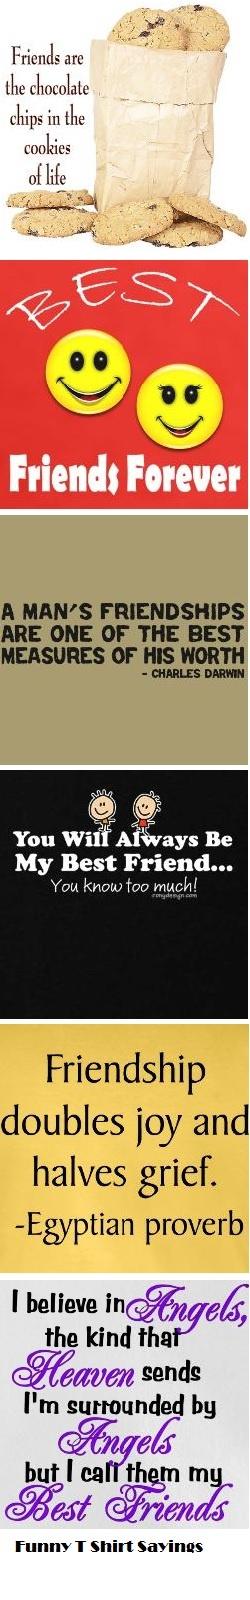 best quotes on friendship  best quotes on friendship  quotes on true friendship  best quotes on friendship  quotes on best friendship